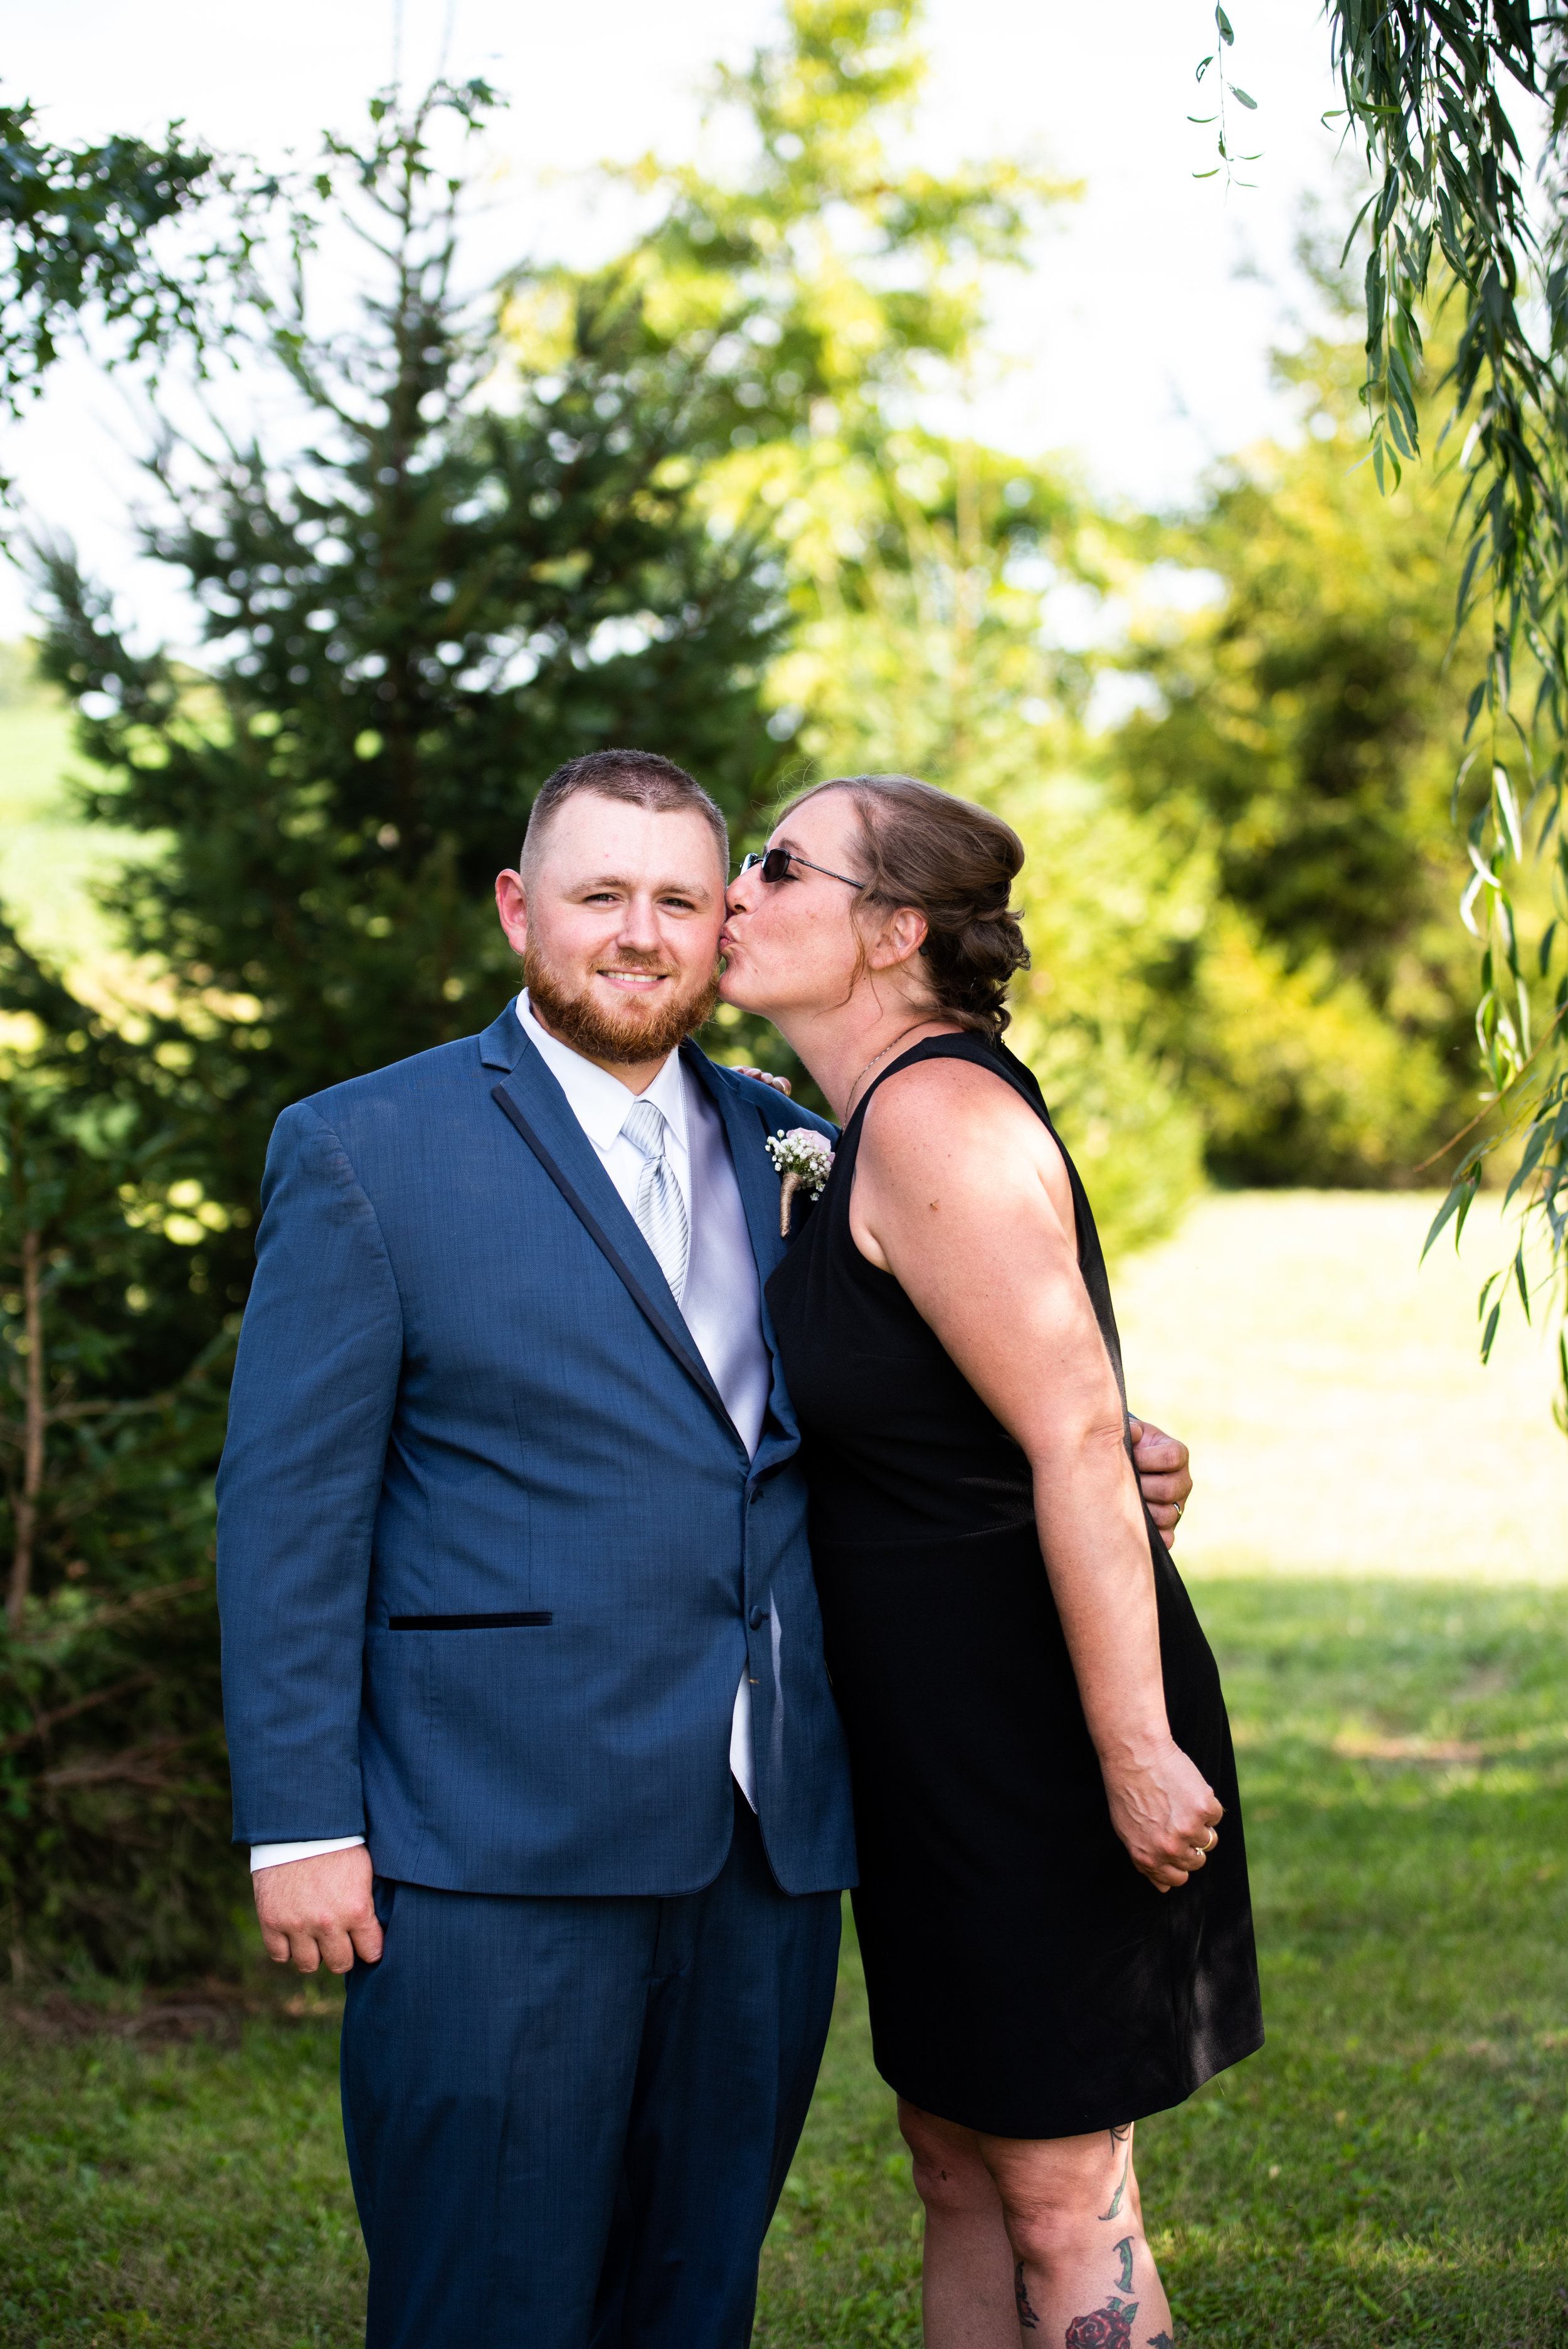 wedding (1 of 1)-126.jpg